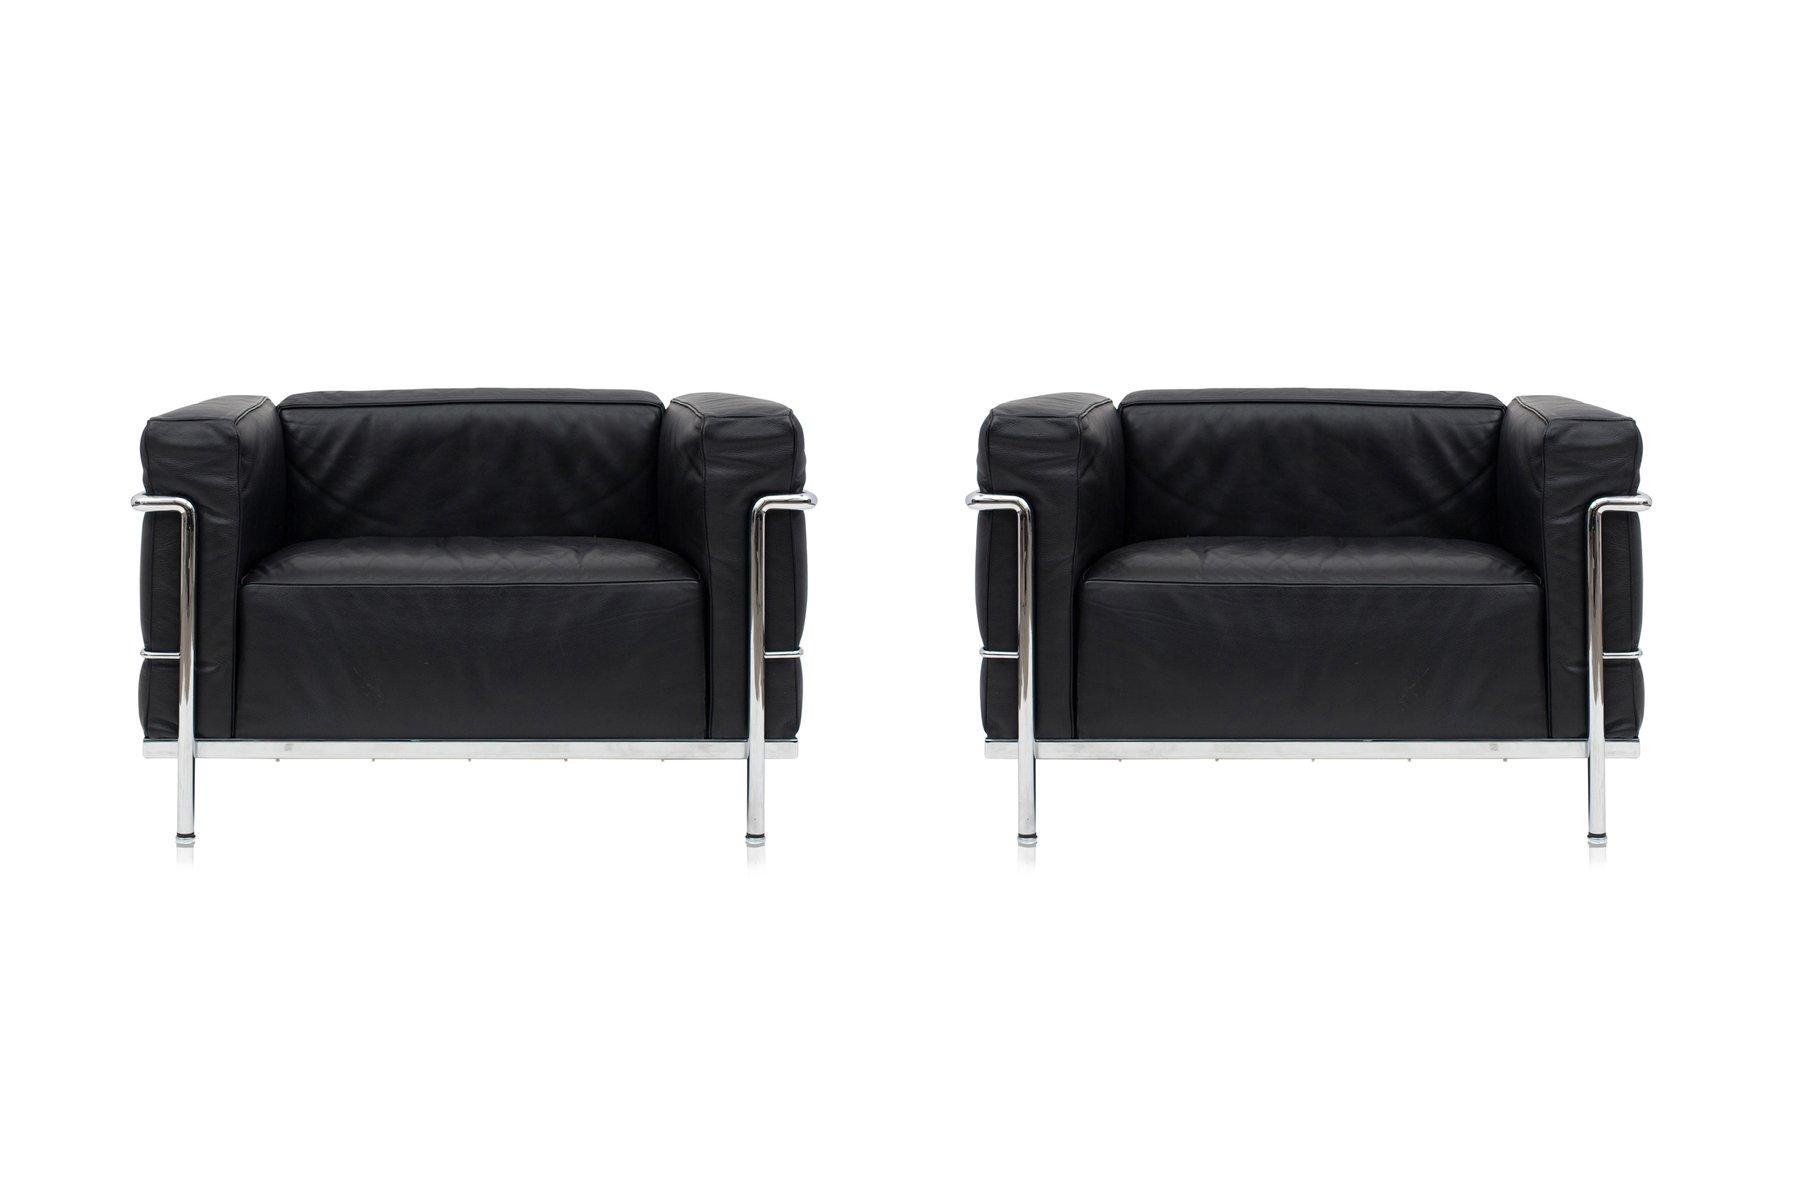 corbusier stuhl interesting stuhl transparent besten le. Black Bedroom Furniture Sets. Home Design Ideas